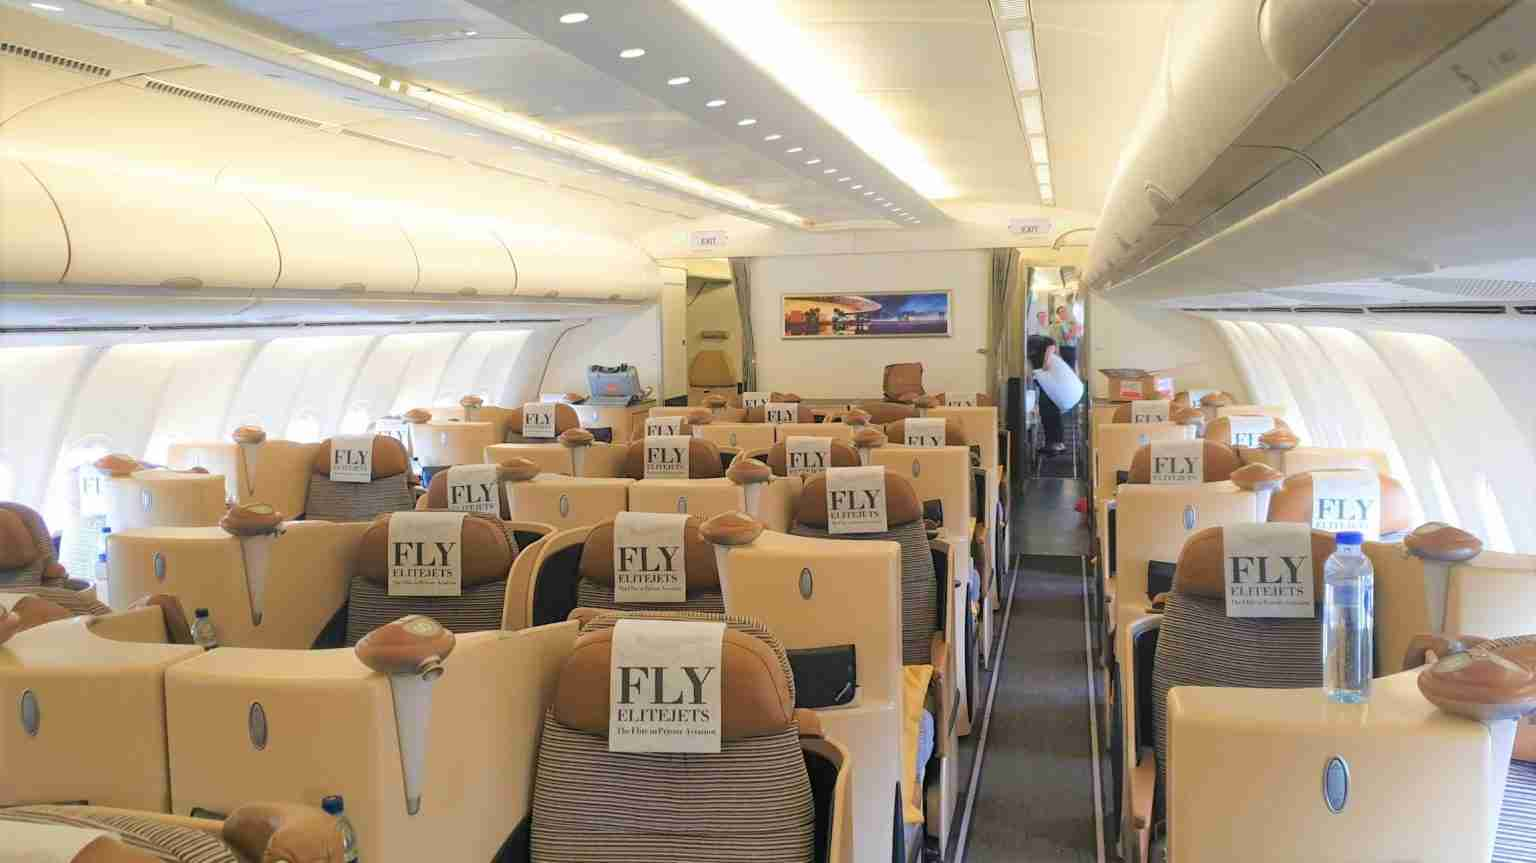 ELITEJETS A340 BUSINESS CLASS